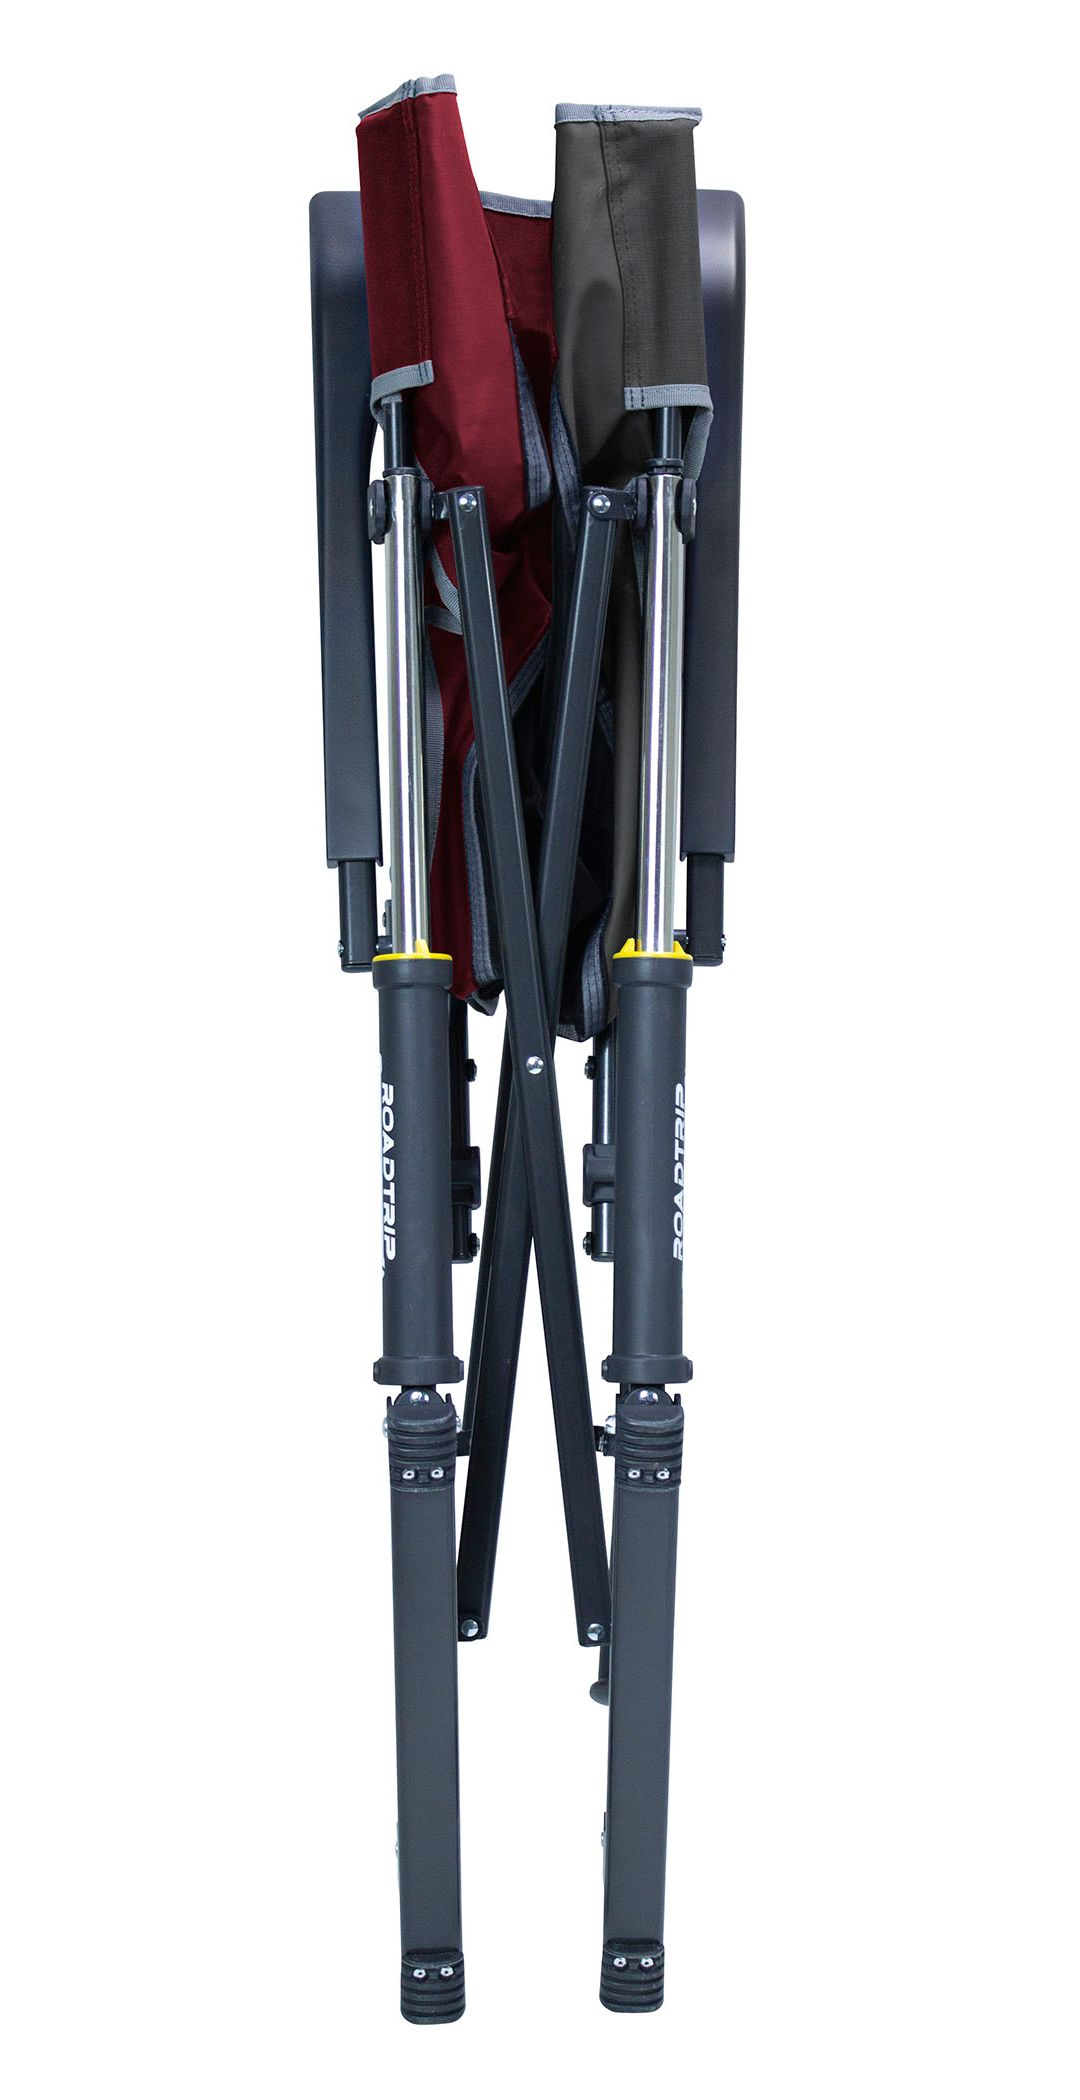 Astonishing Gci Outdoor Roadtrip Rocker Chair Cjindustries Chair Design For Home Cjindustriesco